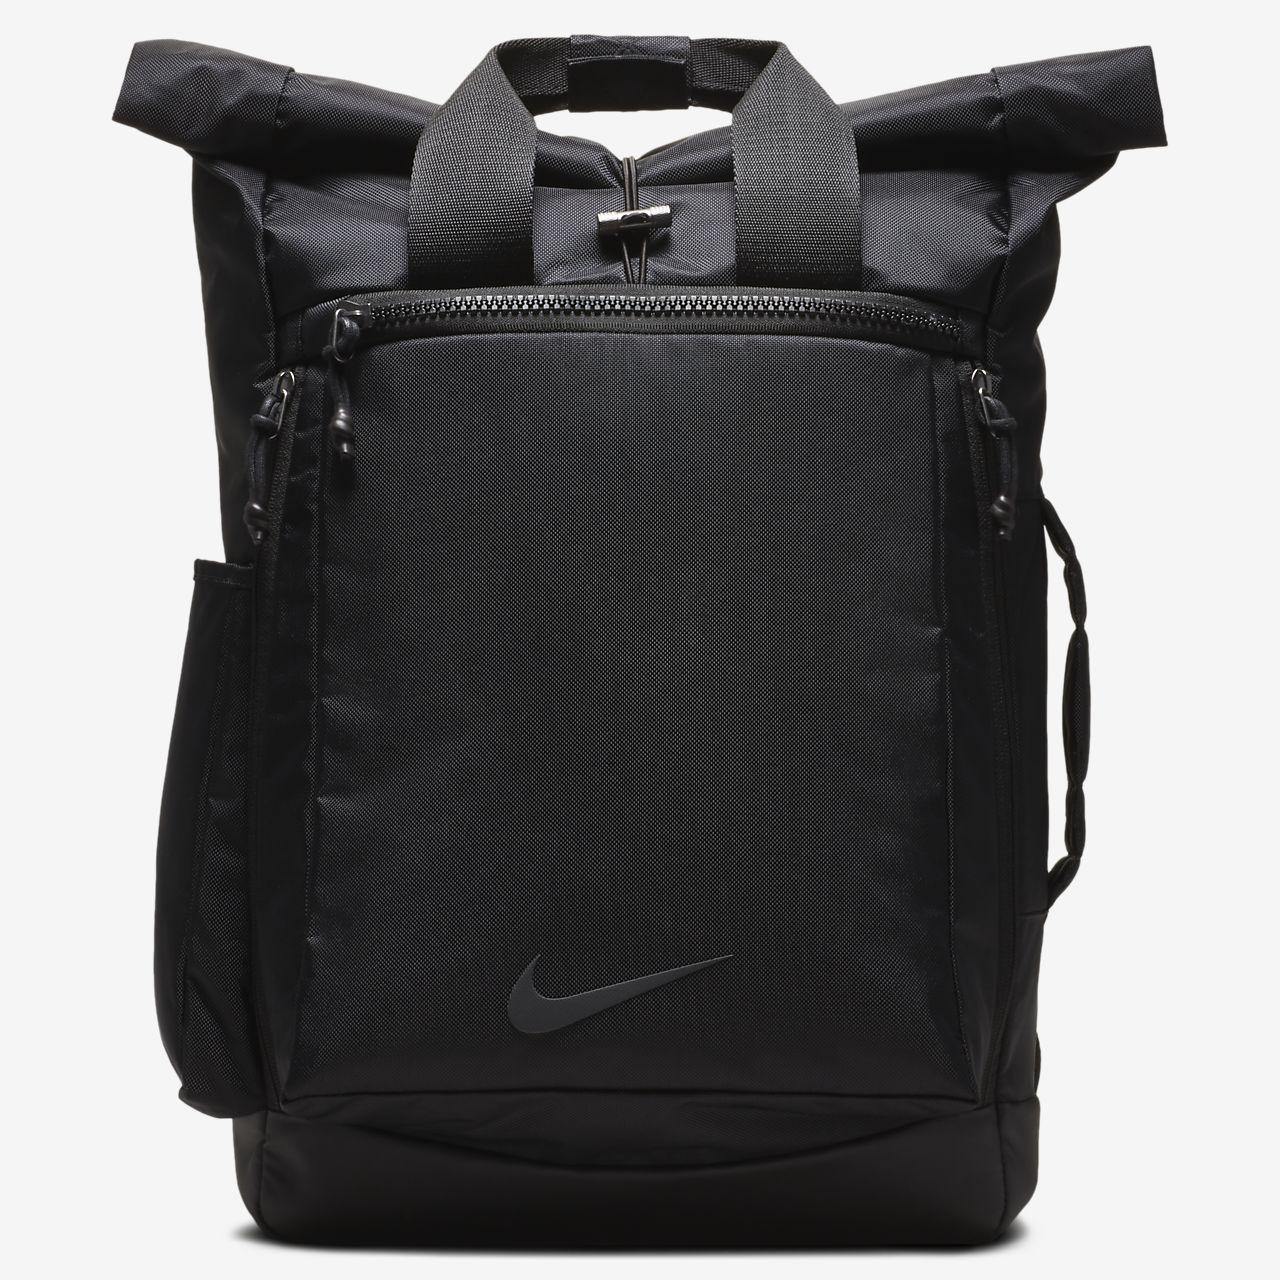 26bccff0bd80d Plecak treningowy Nike Vapor Energy 2.0. Nike.com PL